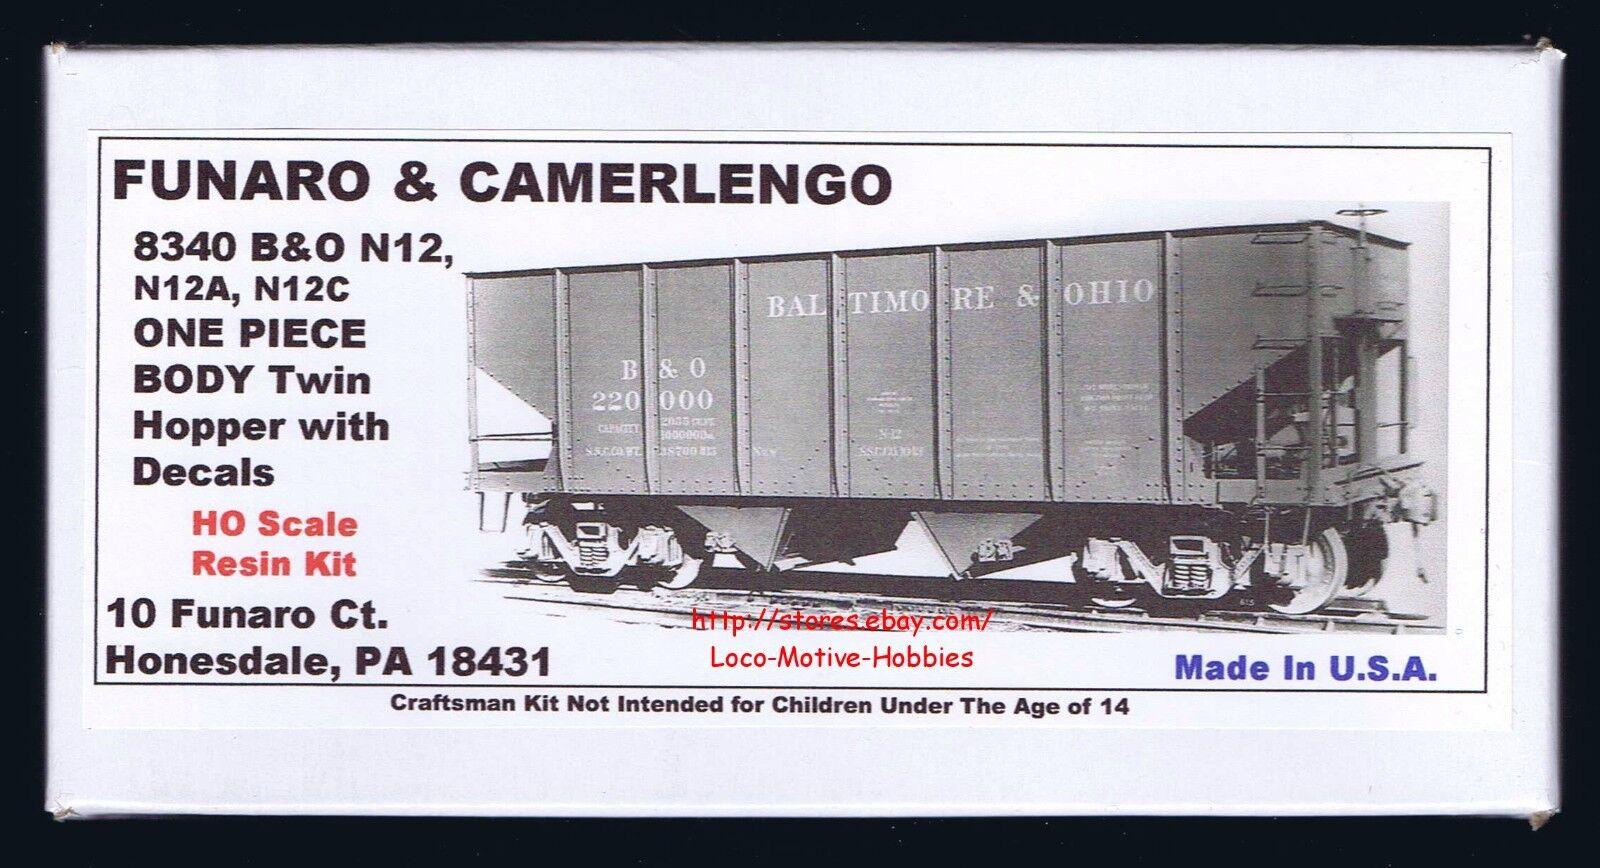 LMH Funaro F/&C 8420  CHESAPEAKE OHIO 50 Ton C/&O H5-27 BABY Triple HOPPER 1 Piece